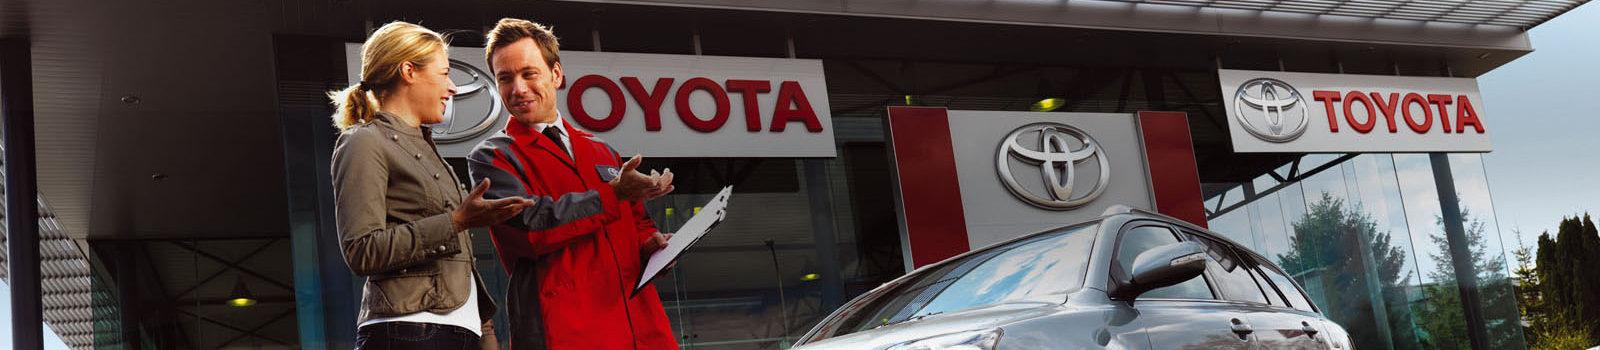 Vacature Service-Adviseur Toyota Roermond